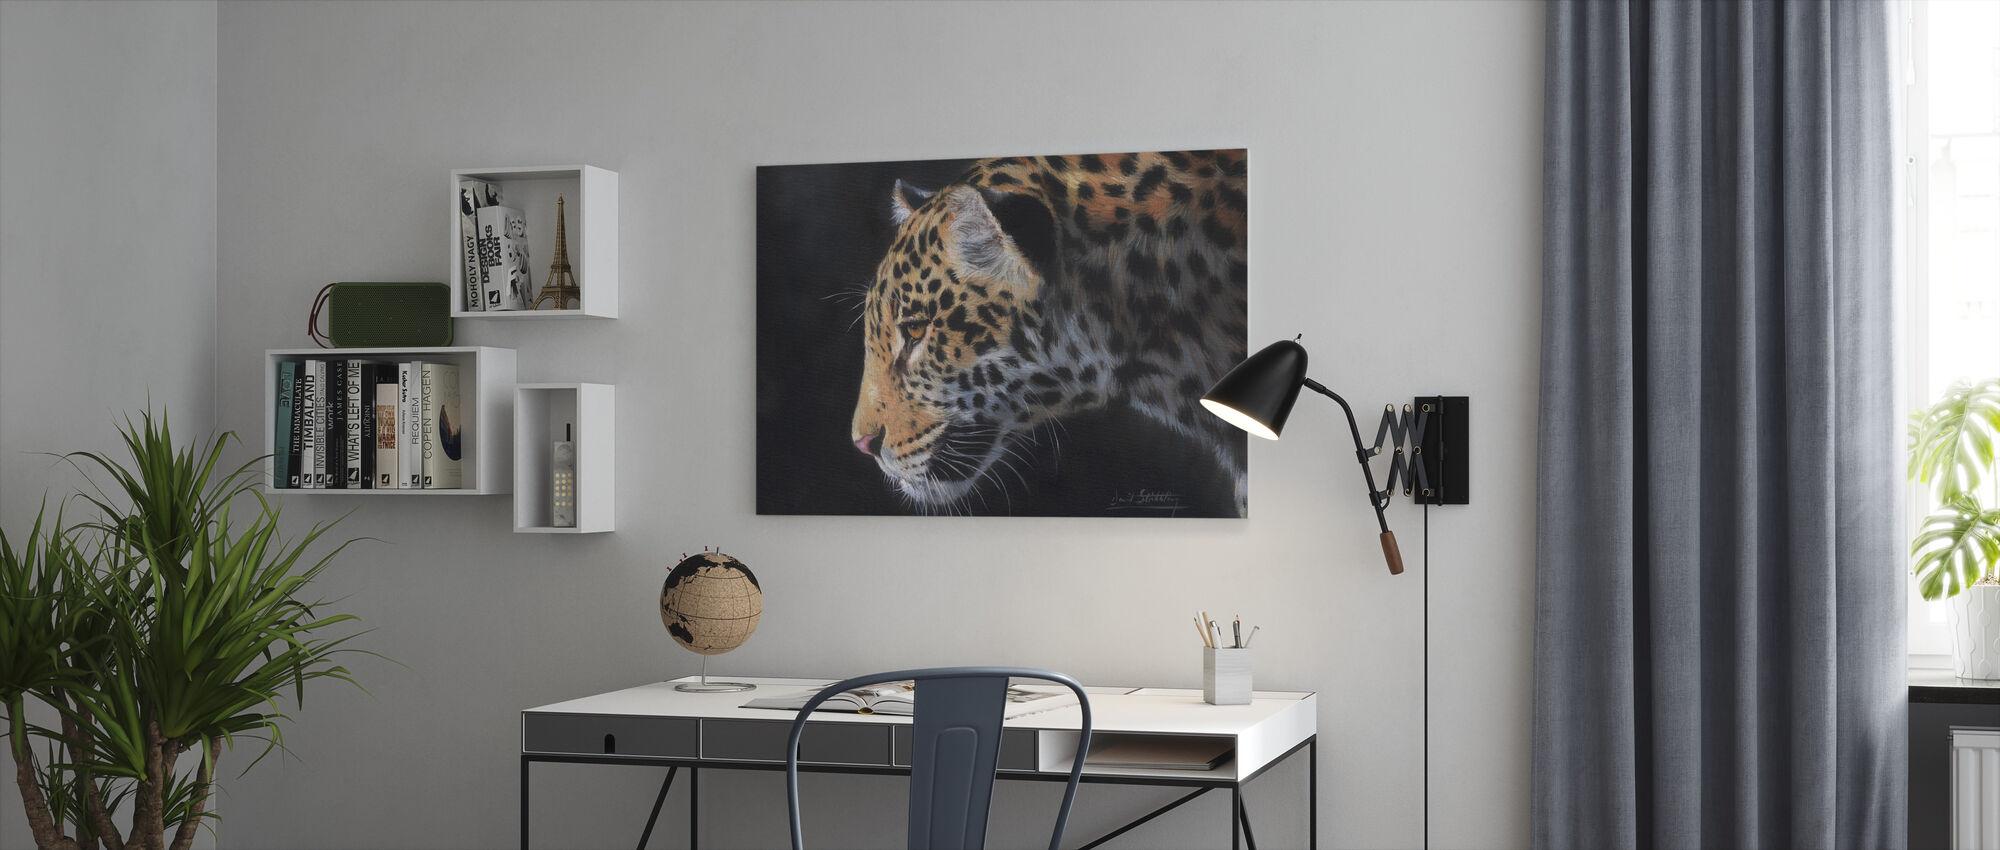 Jaguar Porträtt - Canvastavla - Kontor